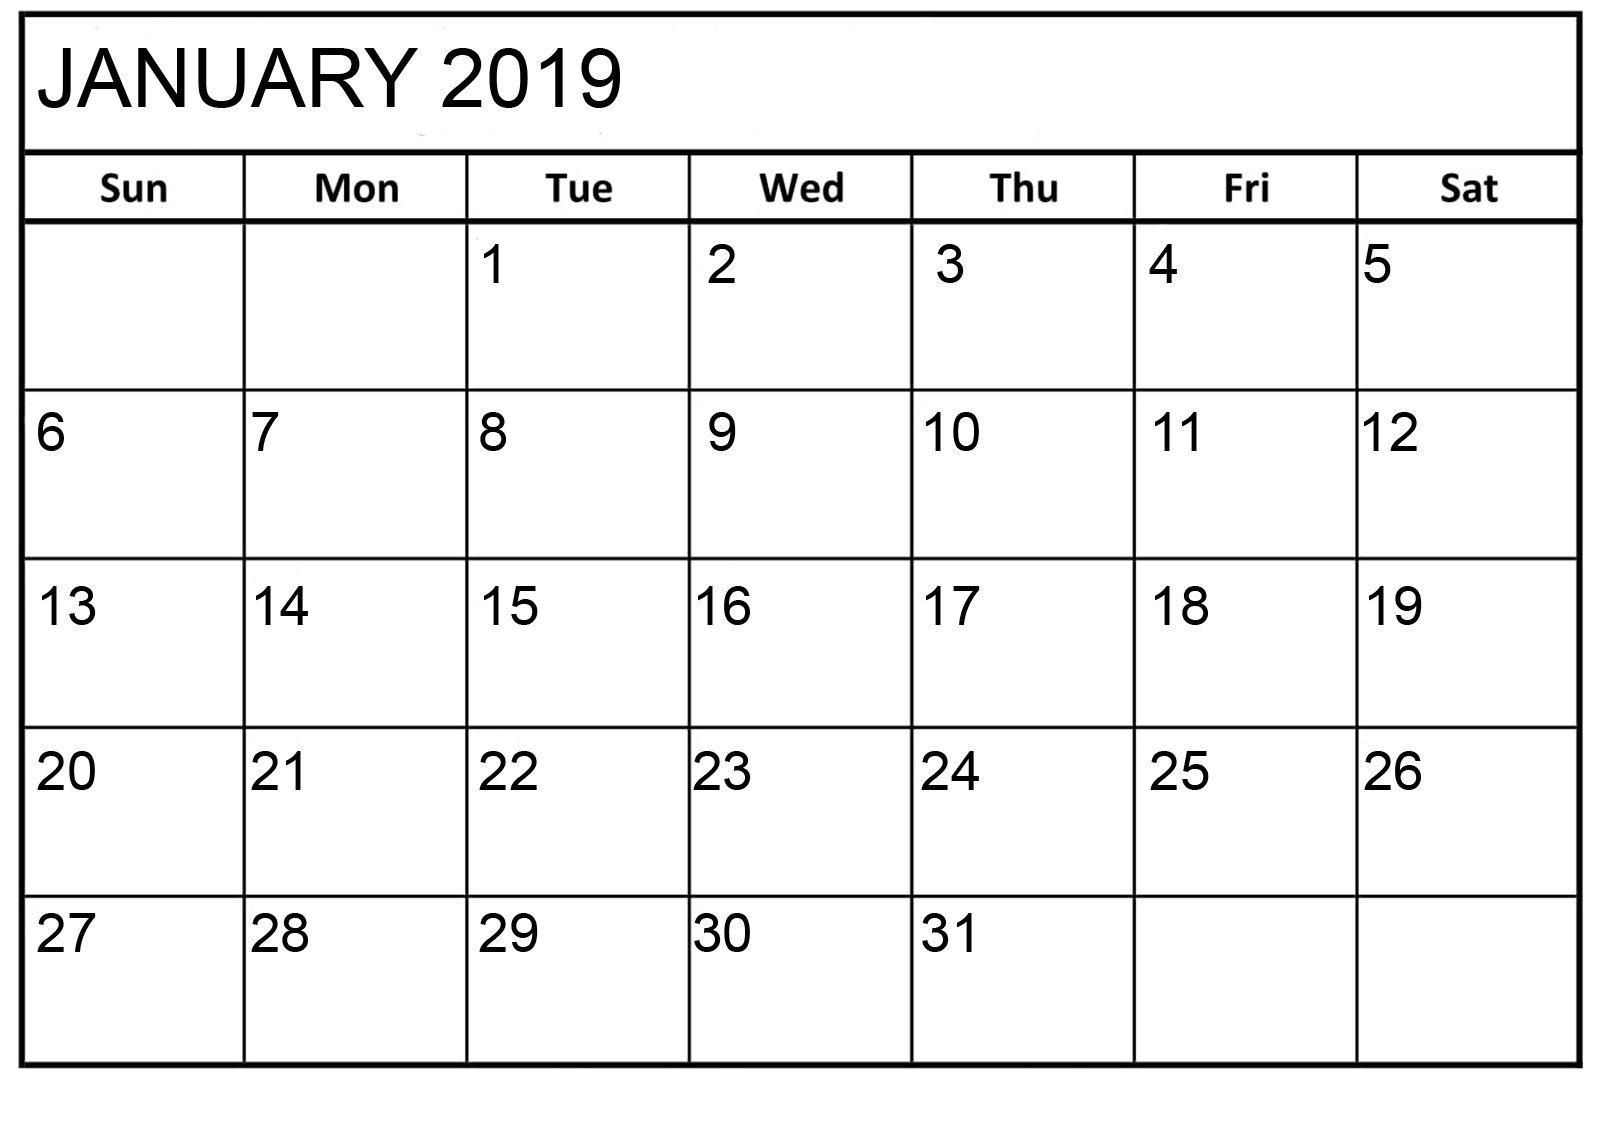 Printable Calendar Monthly 2019-2020 Free 11X17 Large Boxes - Calendar Inspiration Design